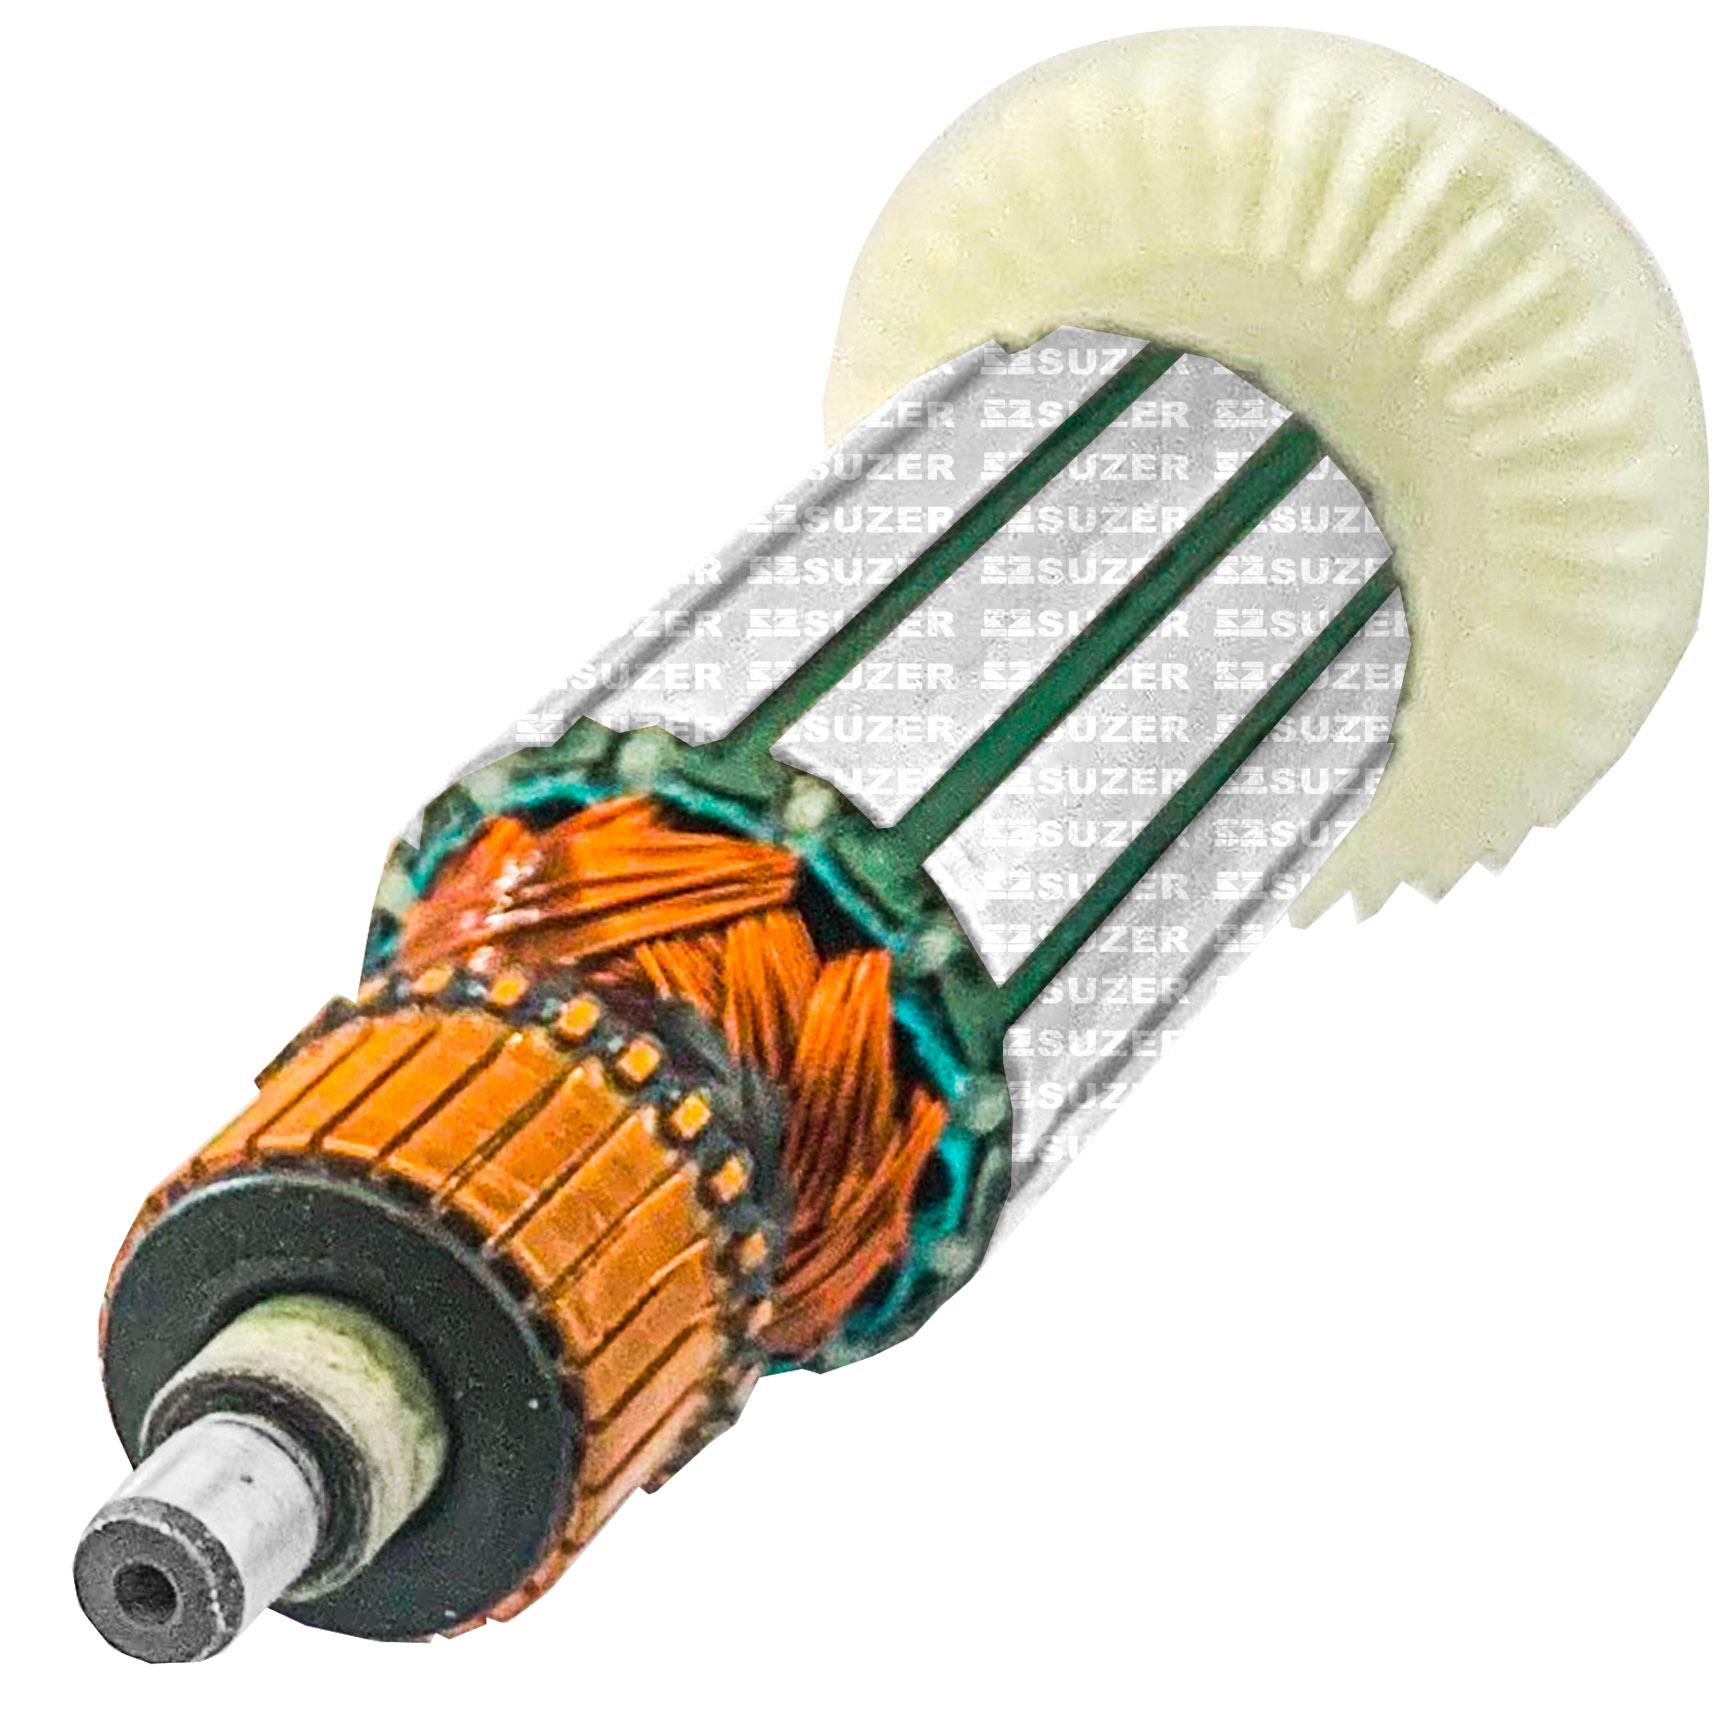 Induzido (rotor) para esmerilhadeira makita Mga450 /452 4 1/2 Polegadas 152mm